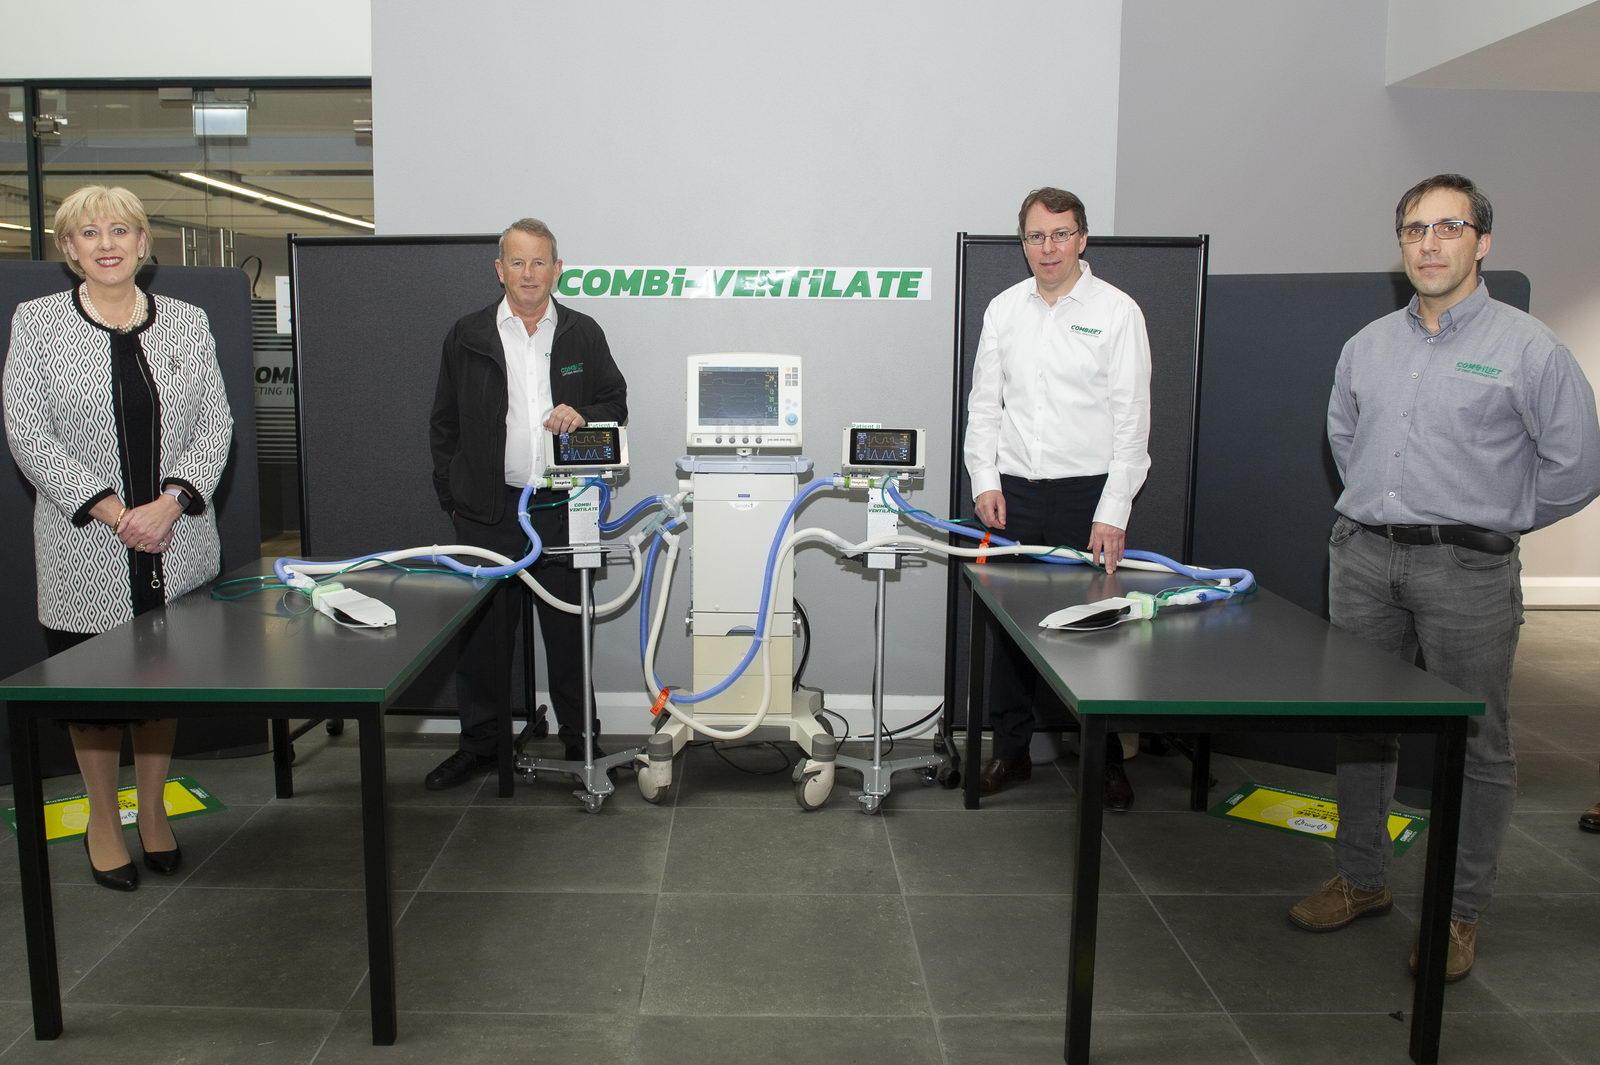 Combilift combi ventilate07 resize